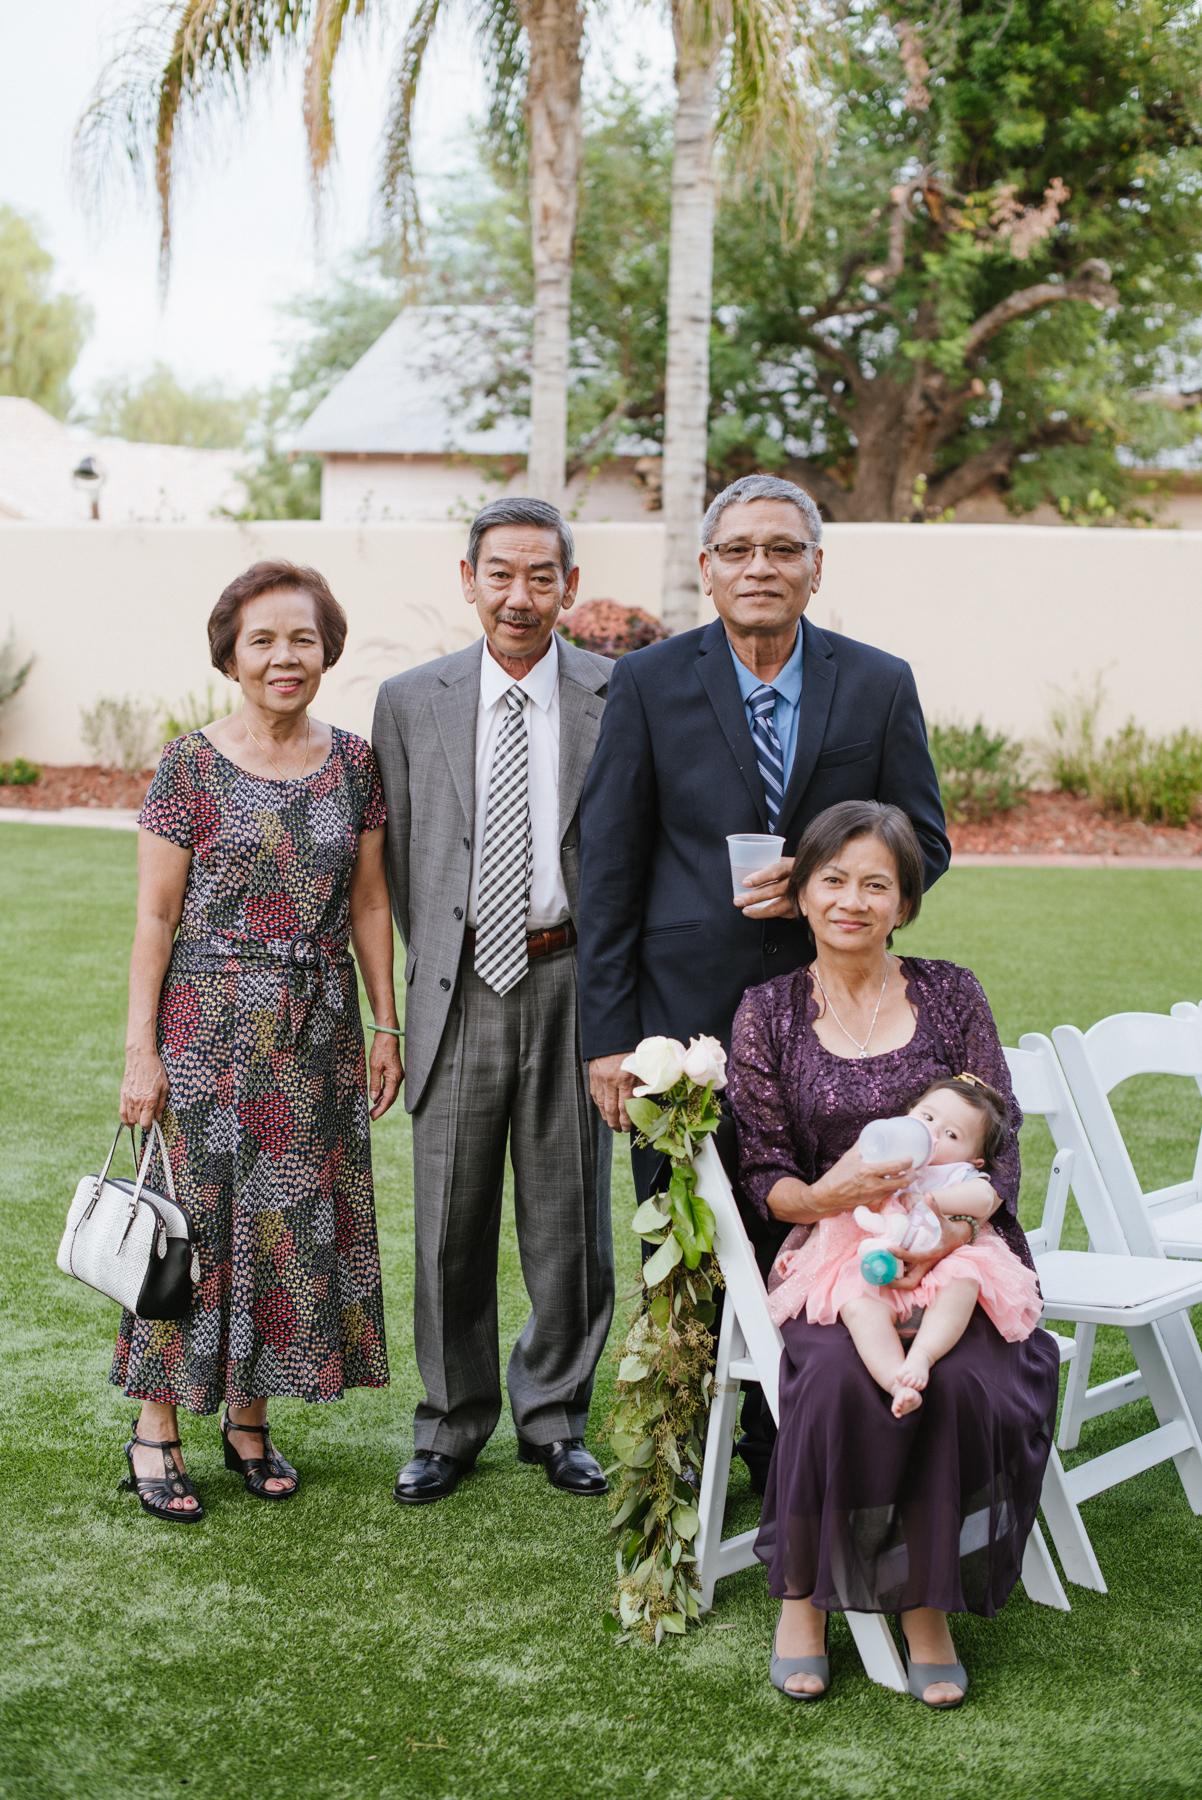 Secret Garden Event Center Wedding - Meredith Amadee Photography-1-7.jpg